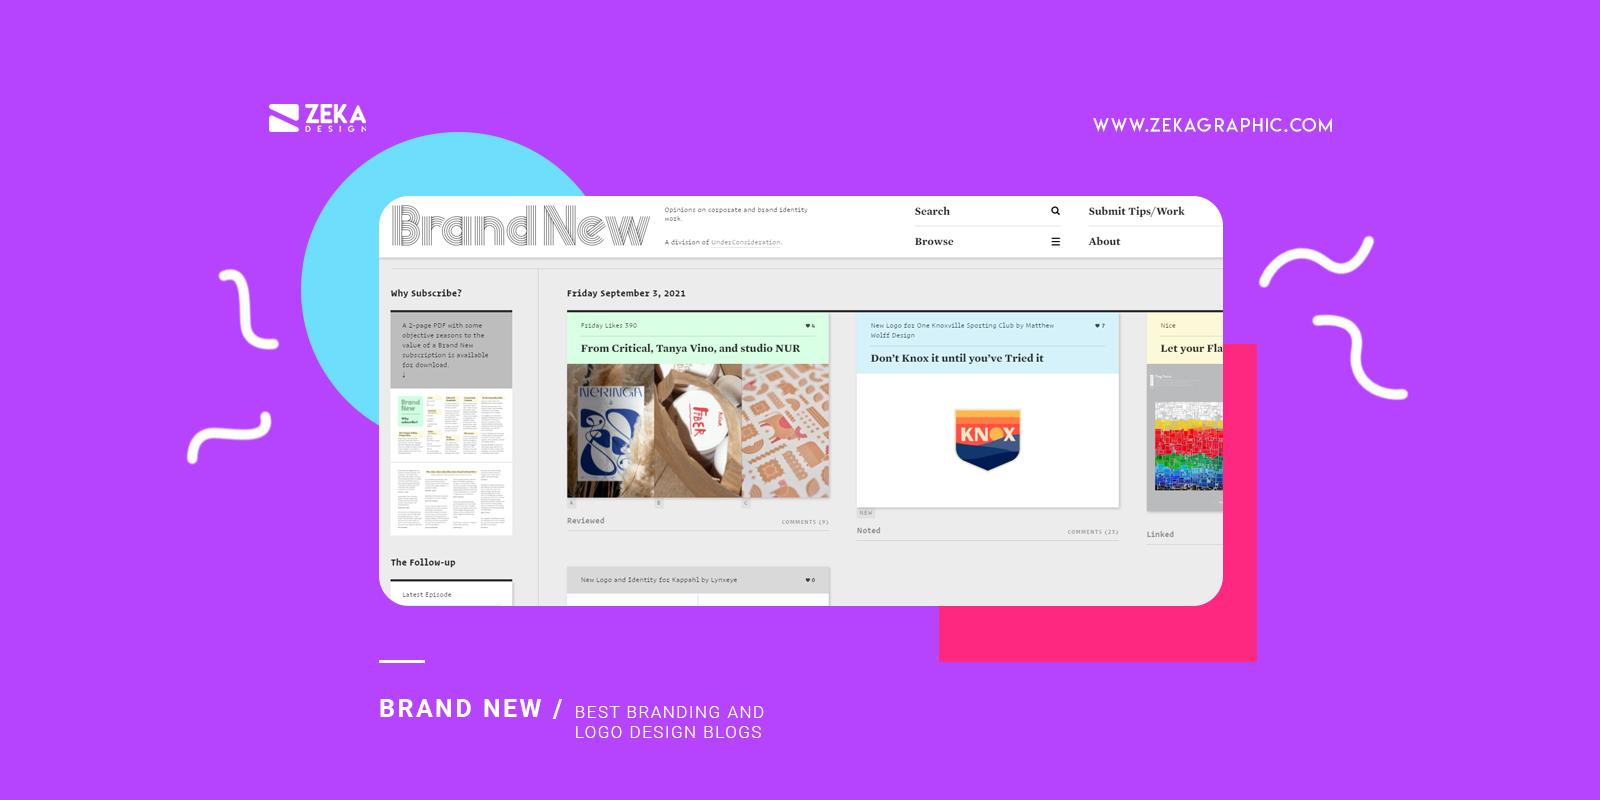 Brand New Best Branding and logo design blogs